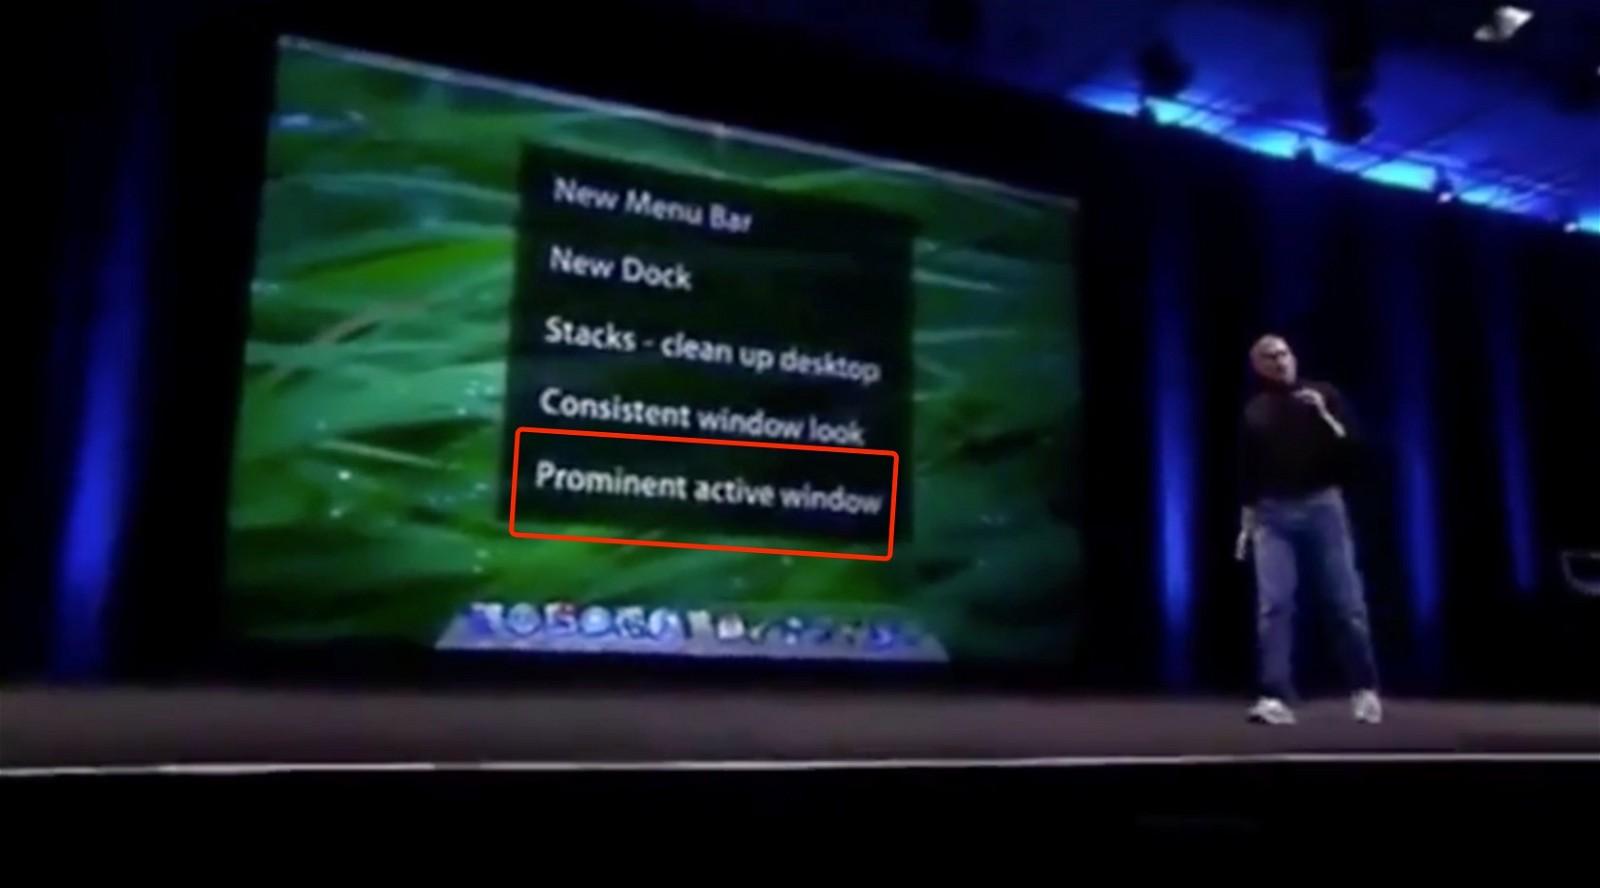 """Prominent active window"" WWDC 2007 Keynote Slide"